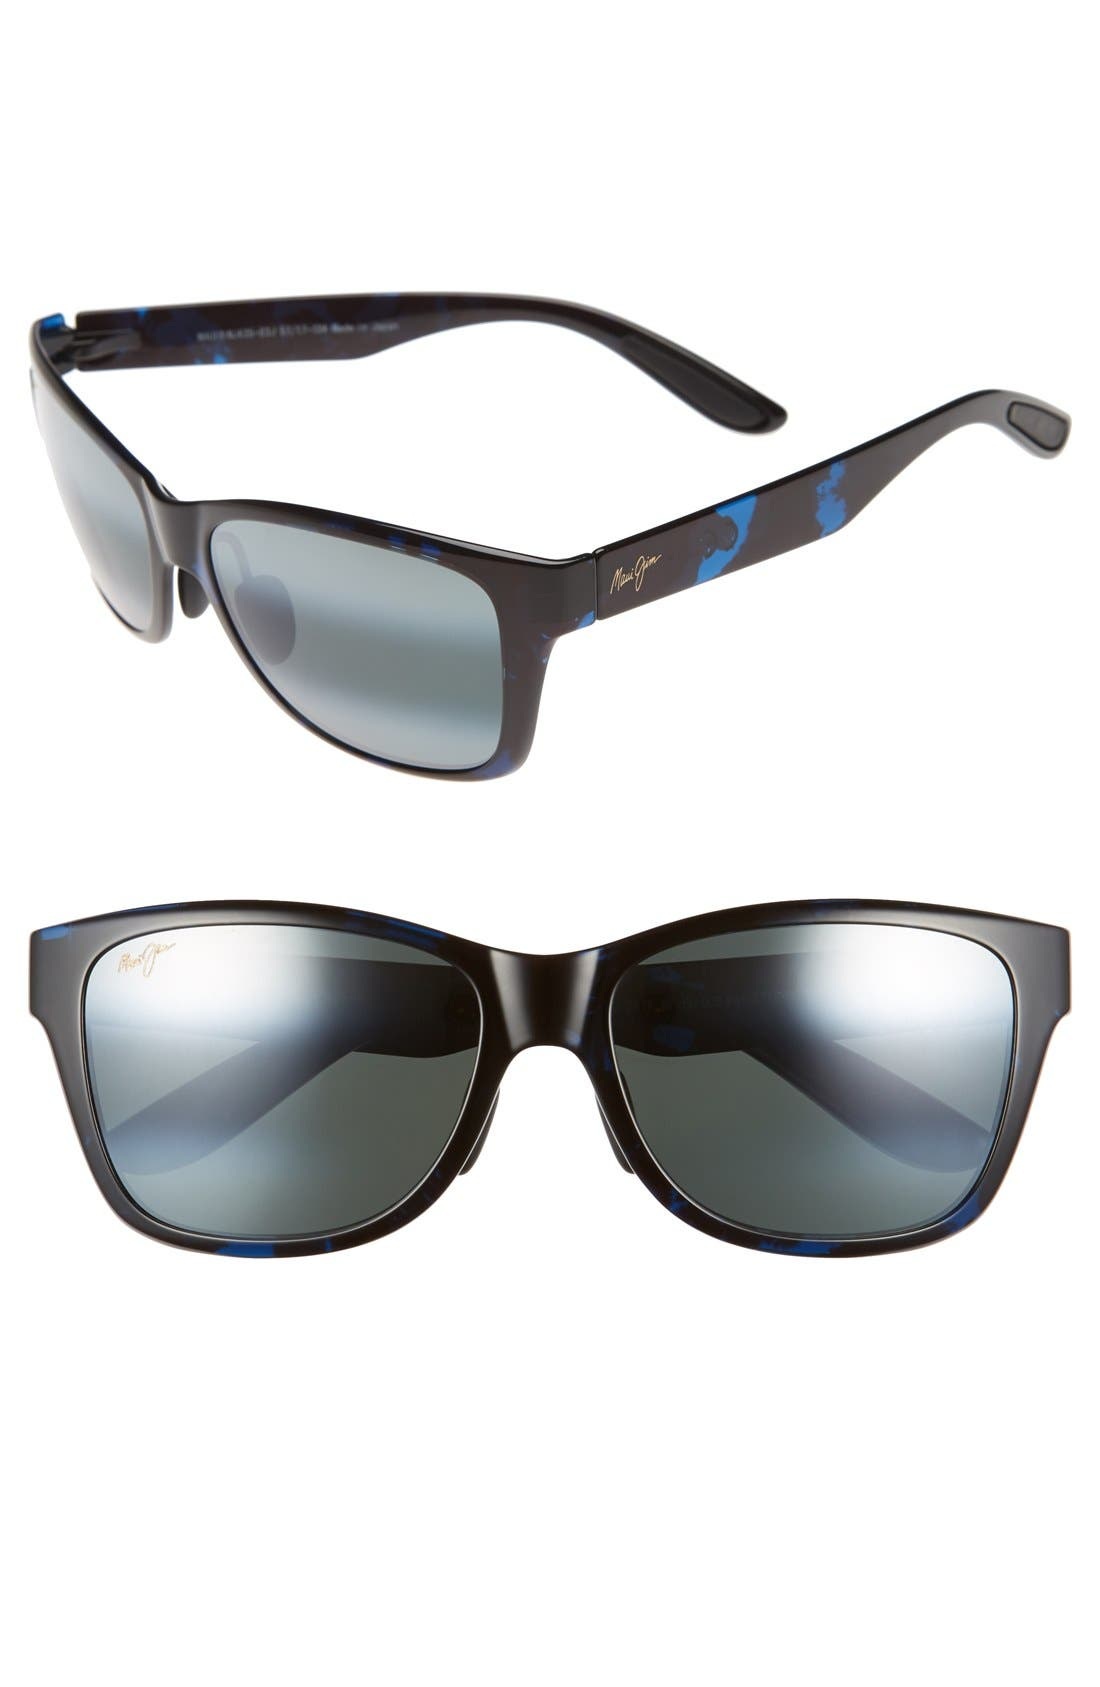 'Road Trip' 57mm Polarized Sunglasses,                         Main,                         color, BLUE AND BLACK TORTOISE/GREY